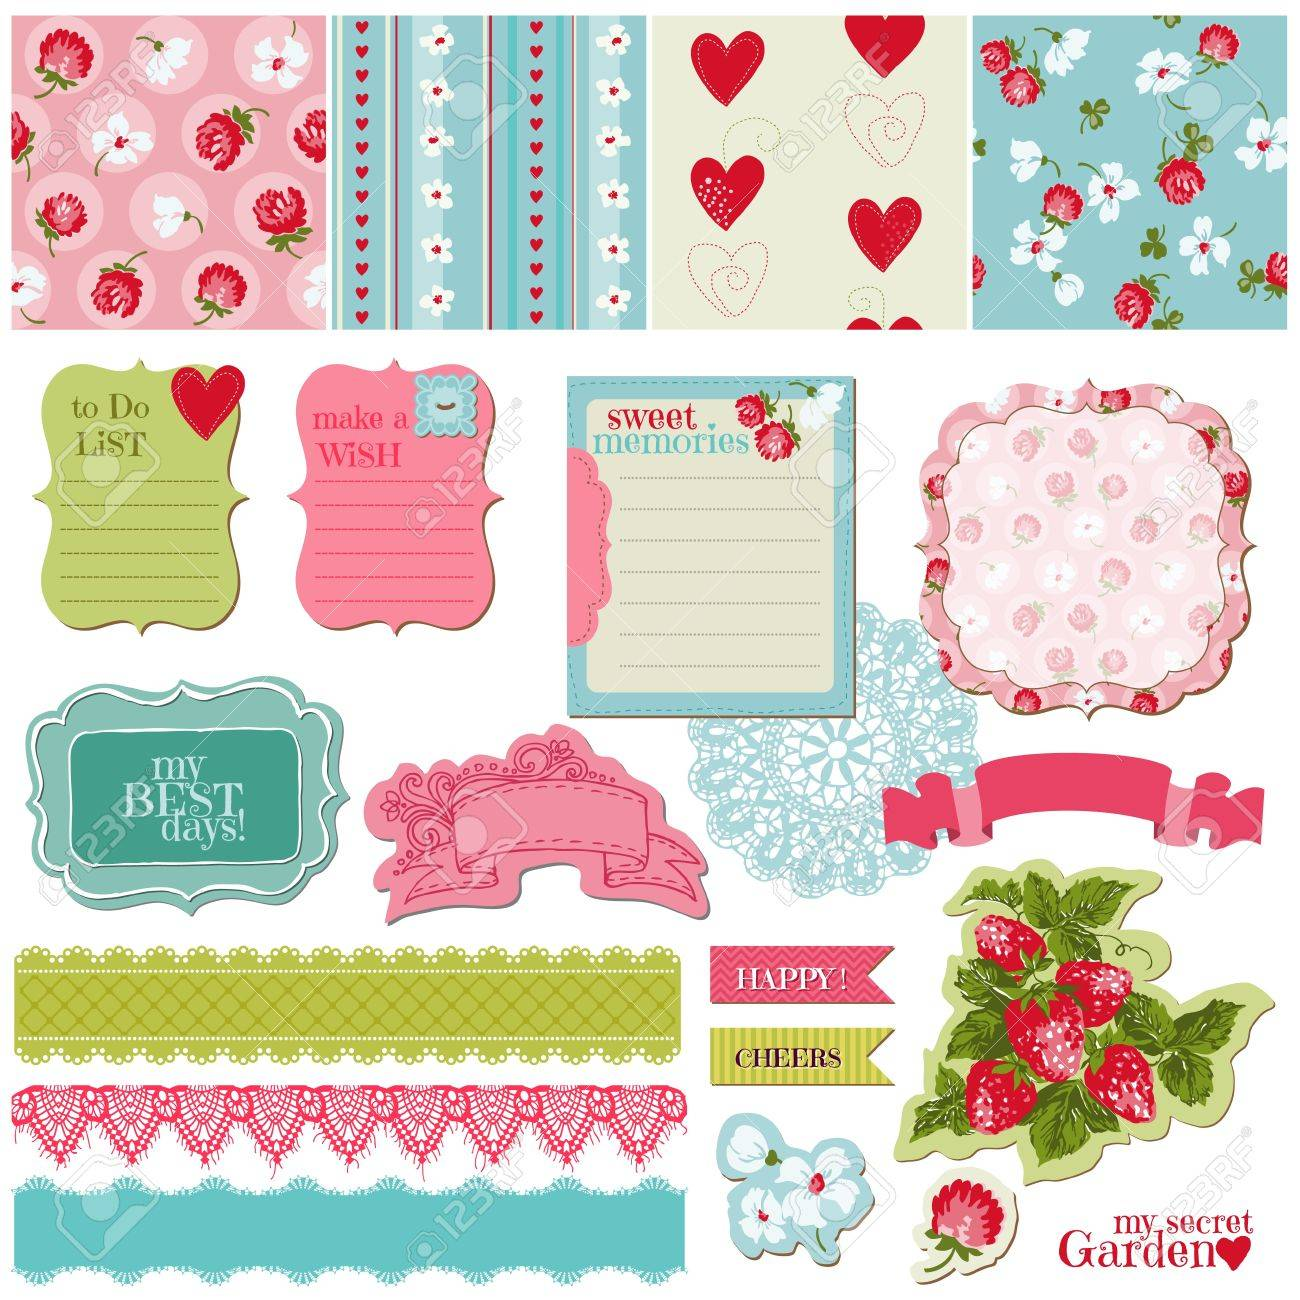 Scrapbook Design Elements - Vintage Flowers and Strawberry Set - in vector Stock Vector - 14460642